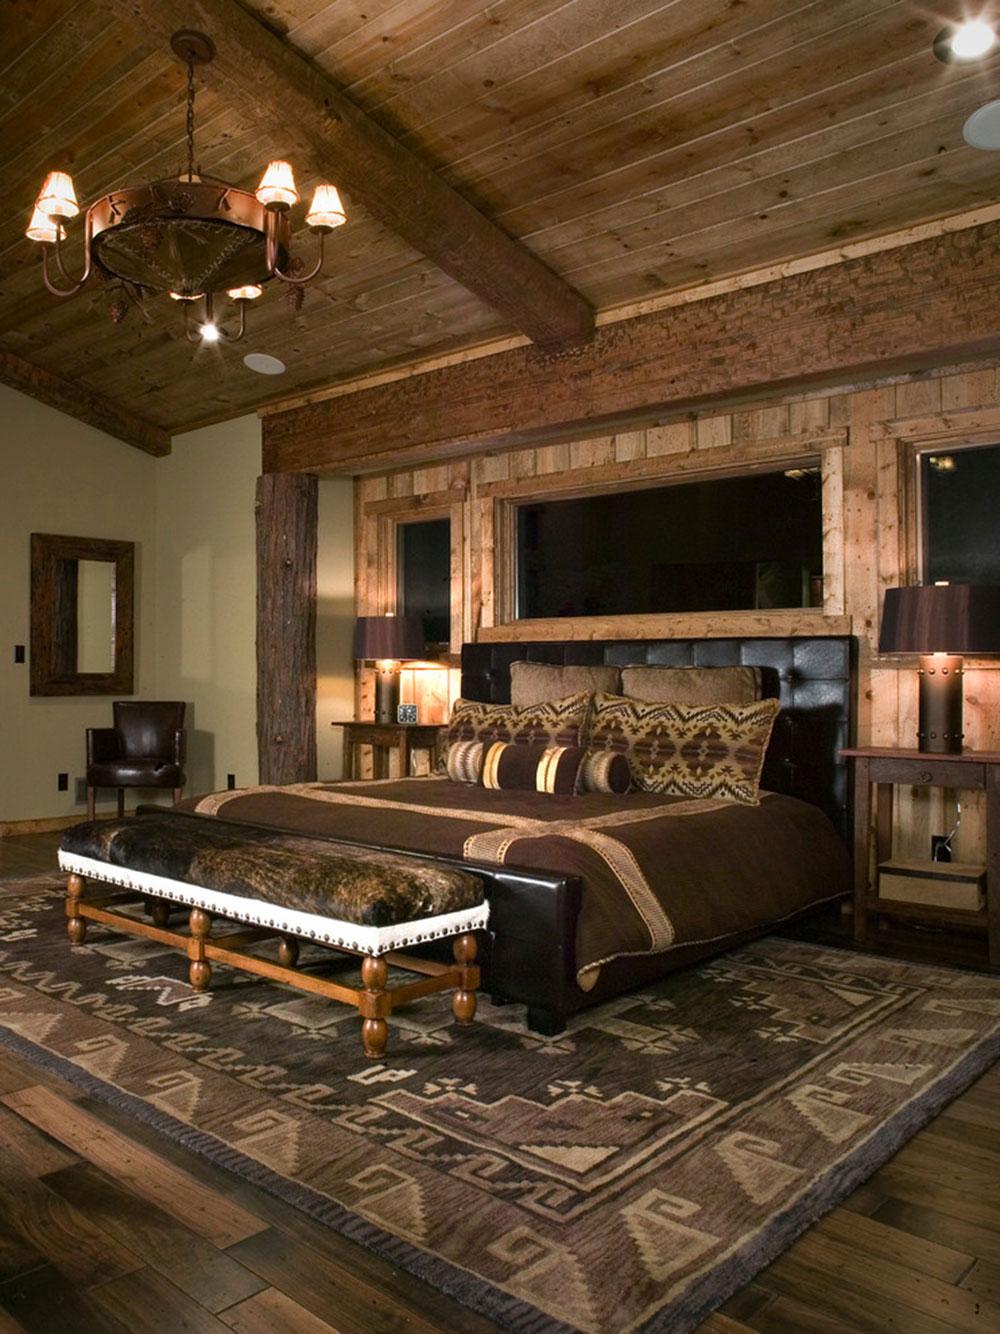 Rustik-sovrum-design-idéer-som-utstrålar-komfort-9 Rustik-sovrum-design-idéer som utstrålar komfort